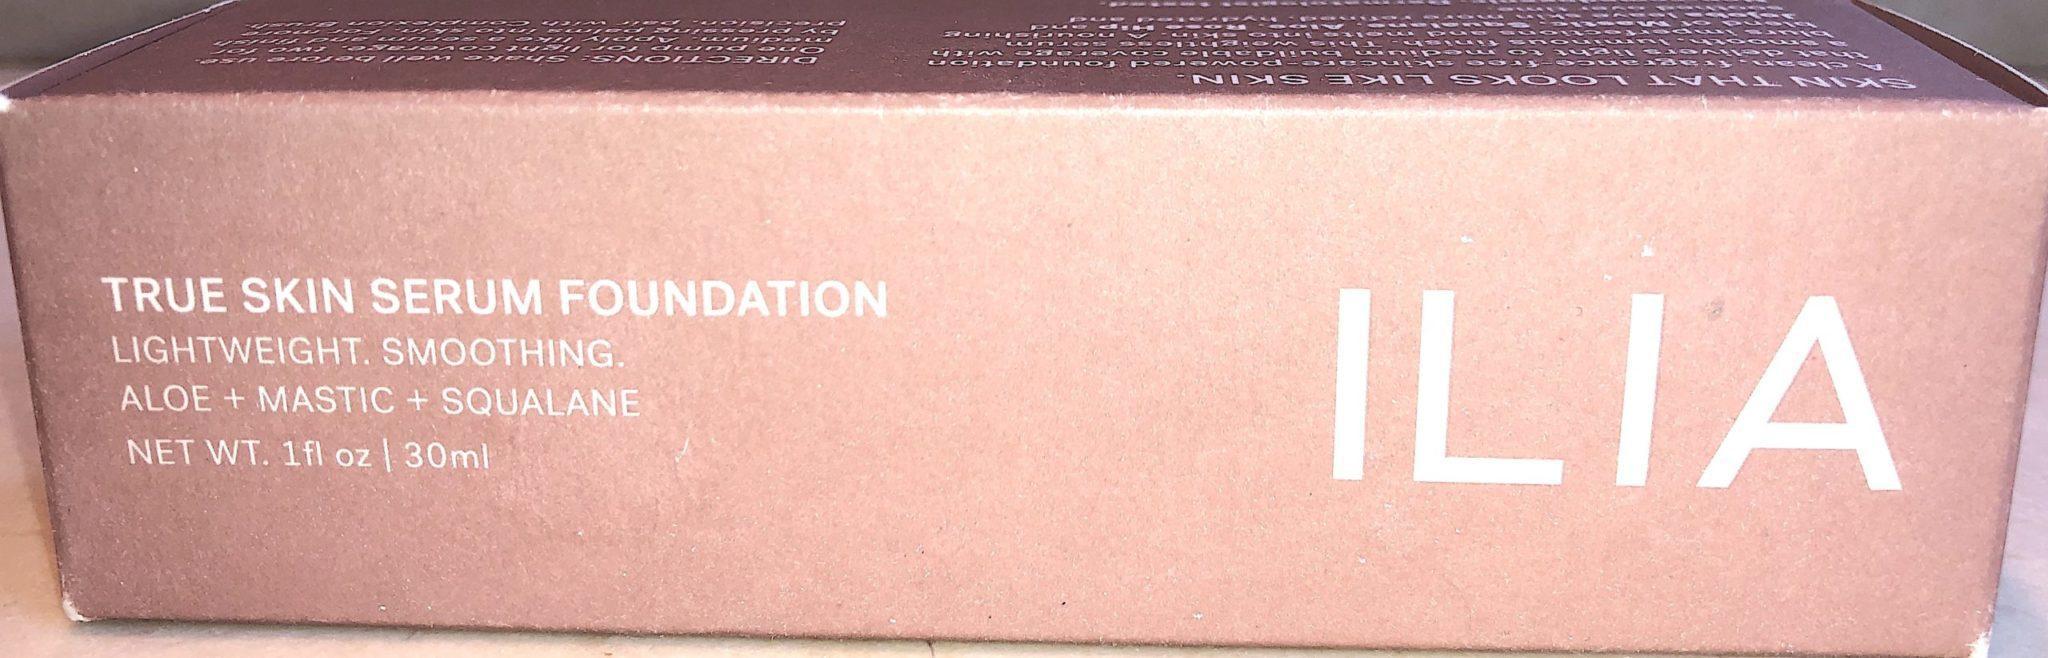 Ilia True Skin Serum Foundation outer box